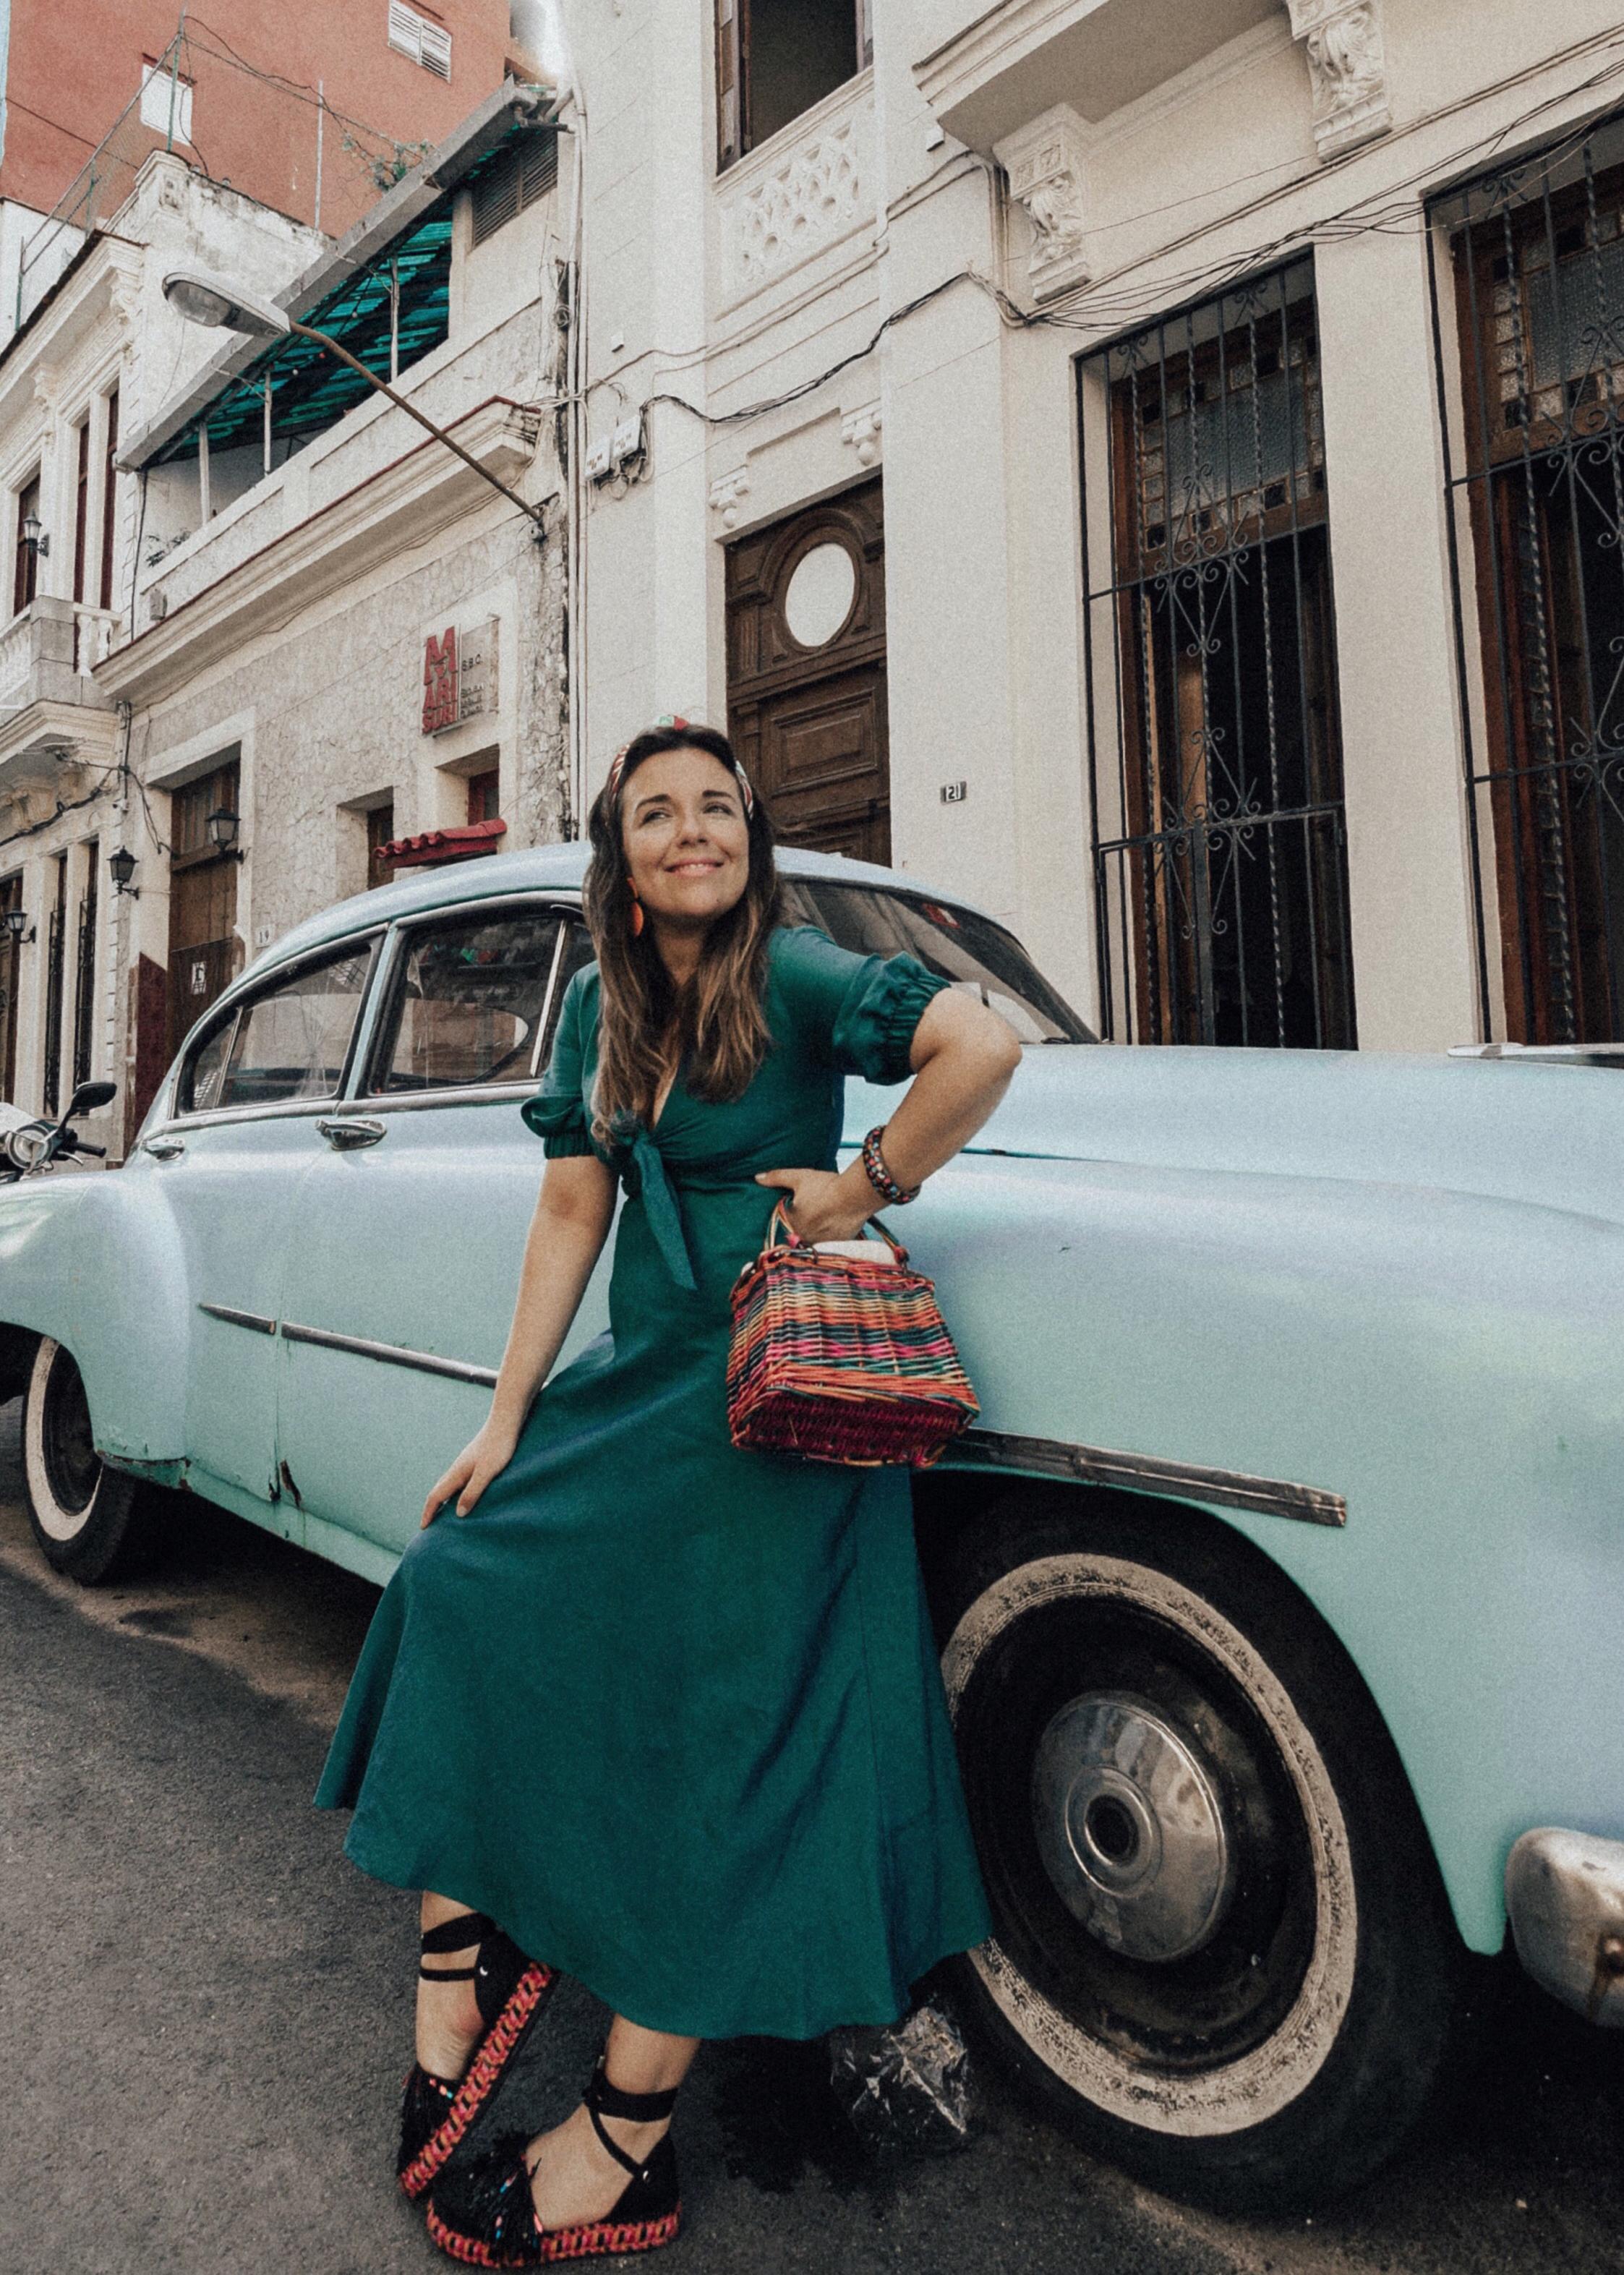 la habana-outfit-zara-line-dress-asos-jalisse-espadrilles-streetstyle